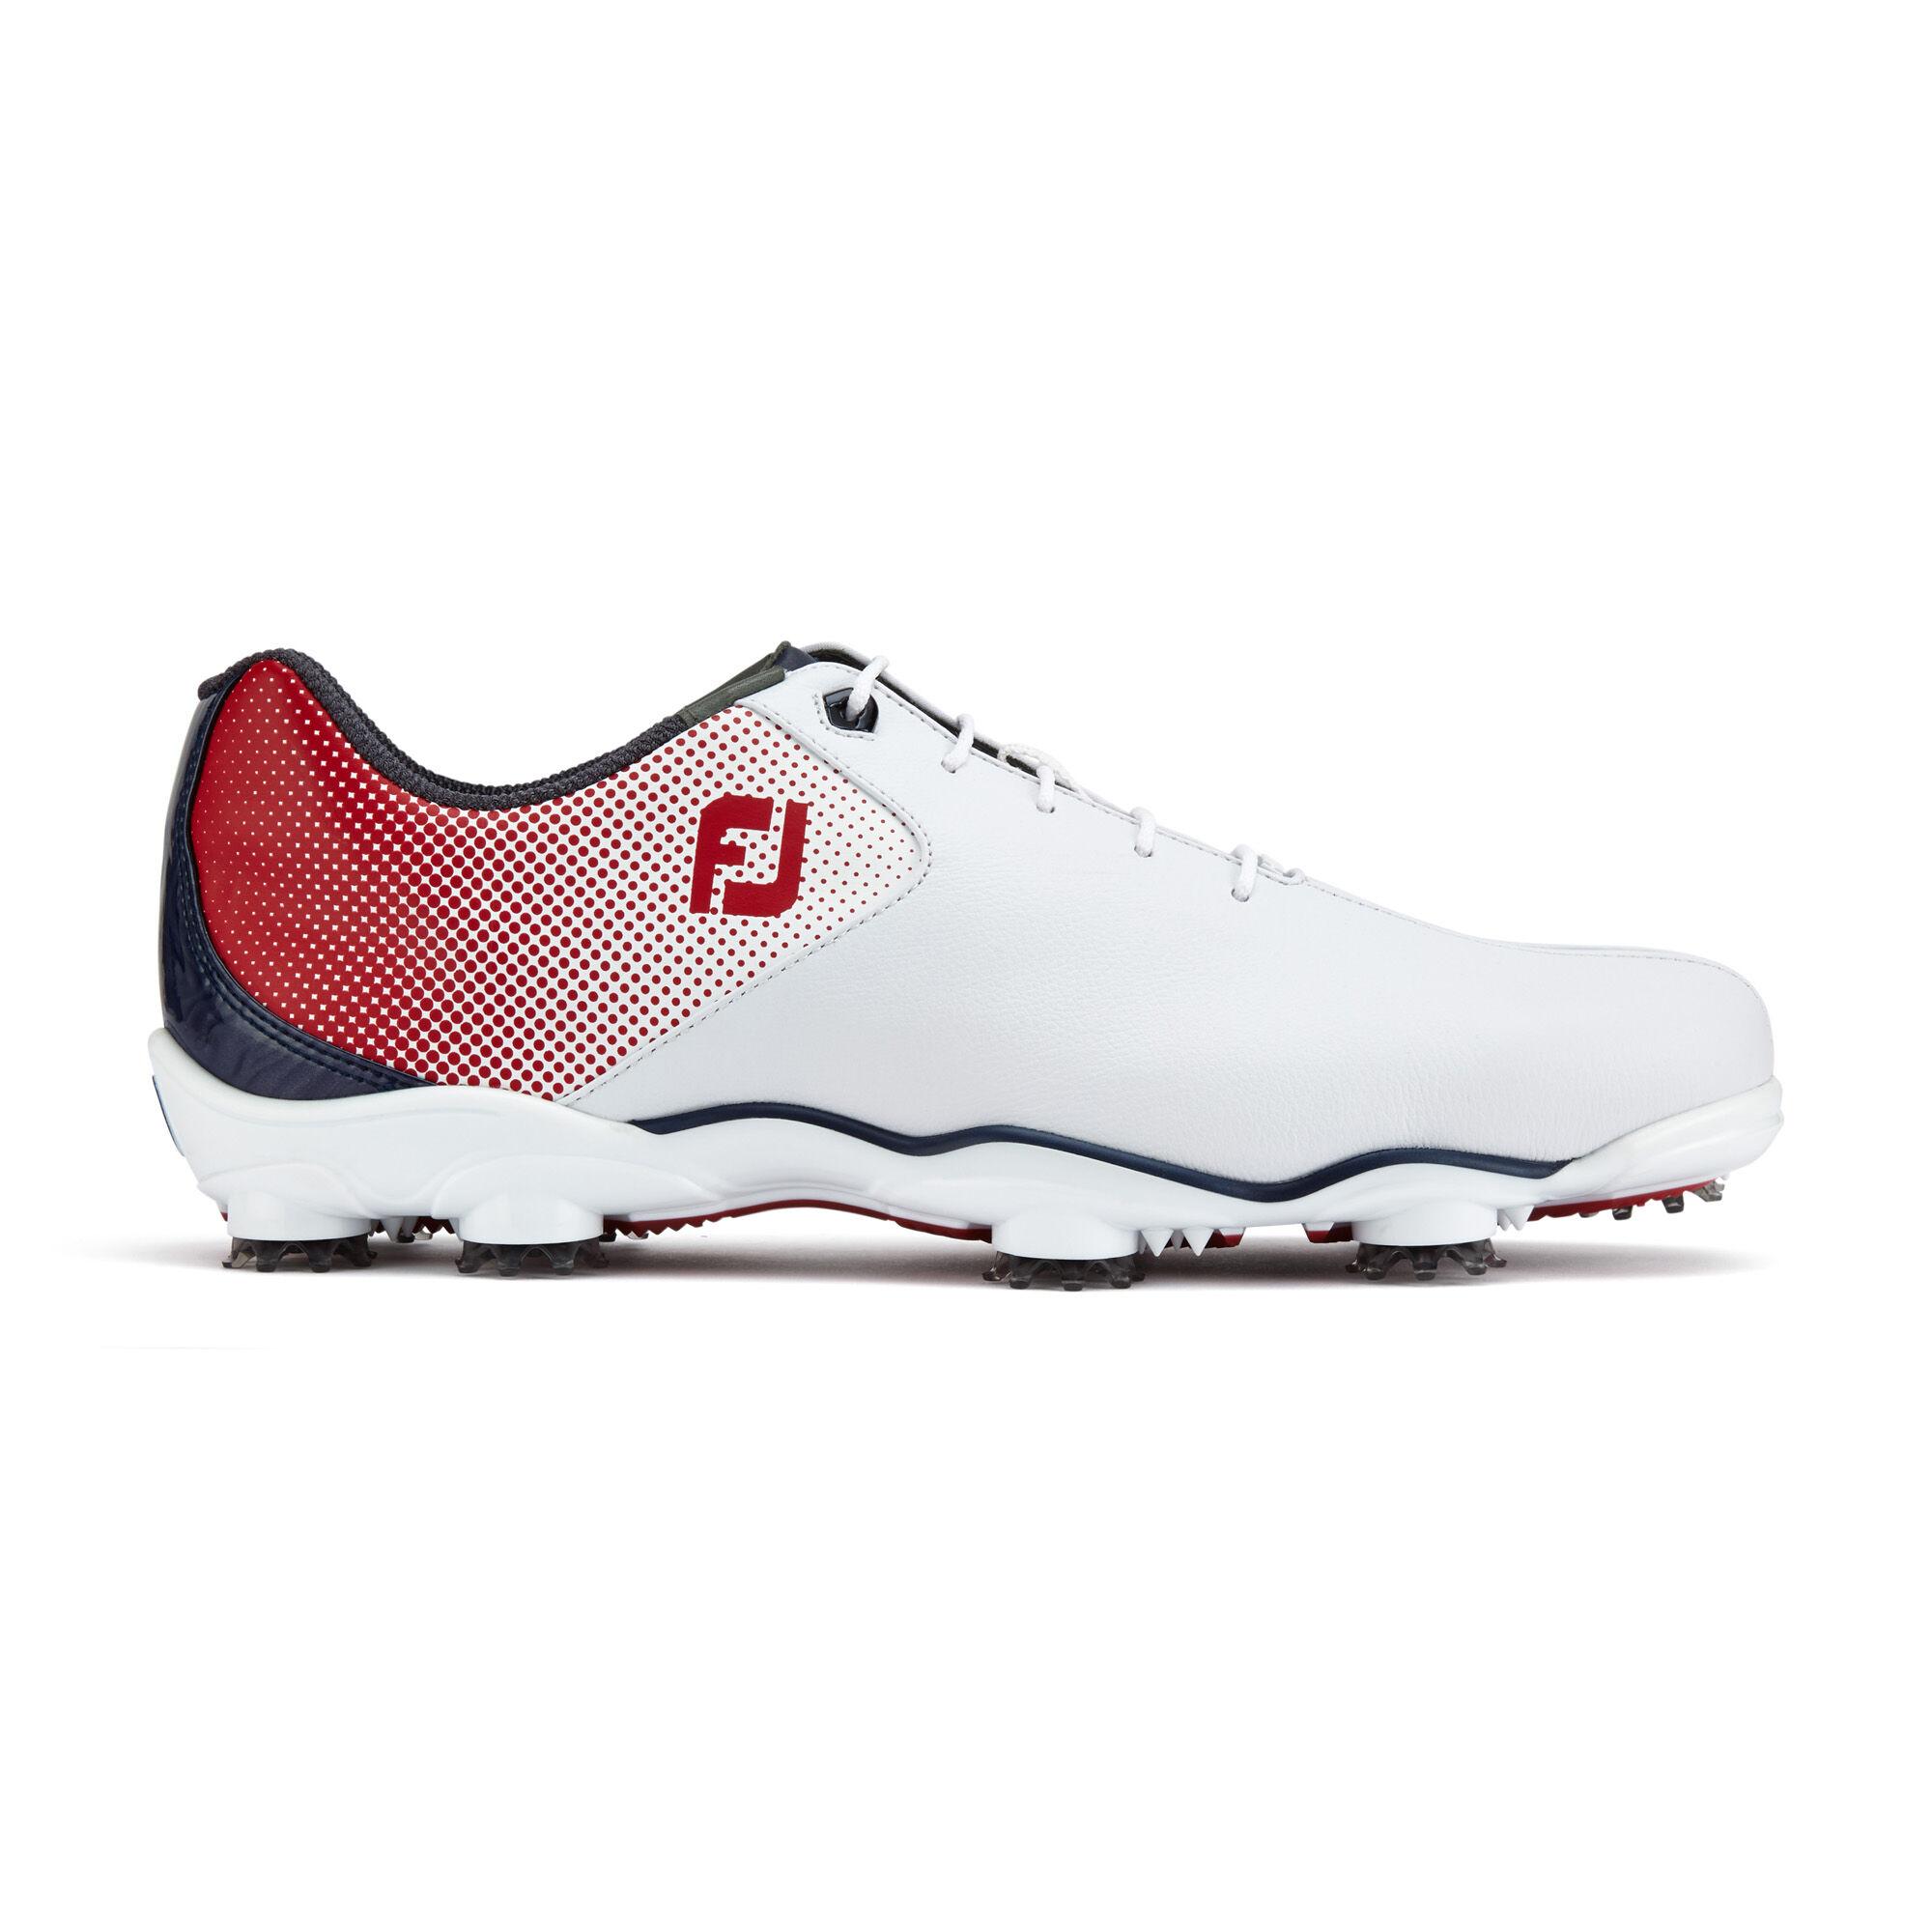 Cheap Price Footjoy Golf Shoes